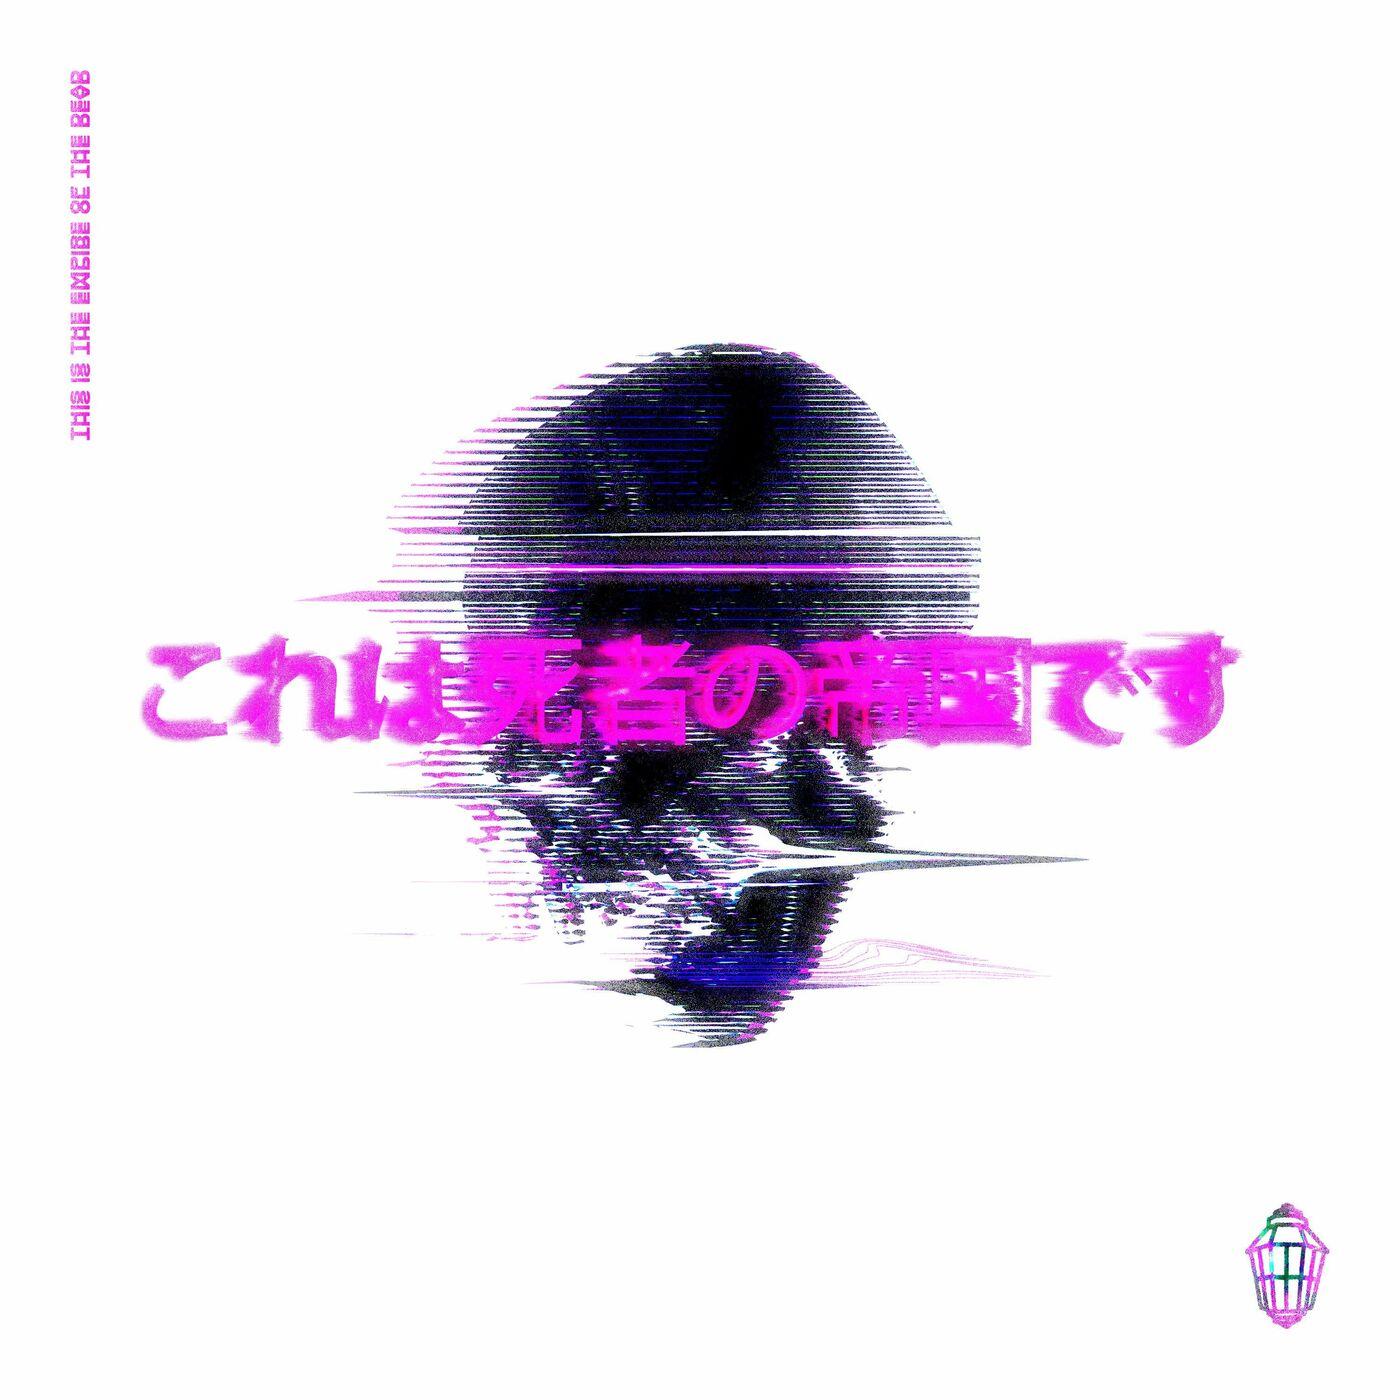 Led by Lanterns - Catacombs [single] (2021)